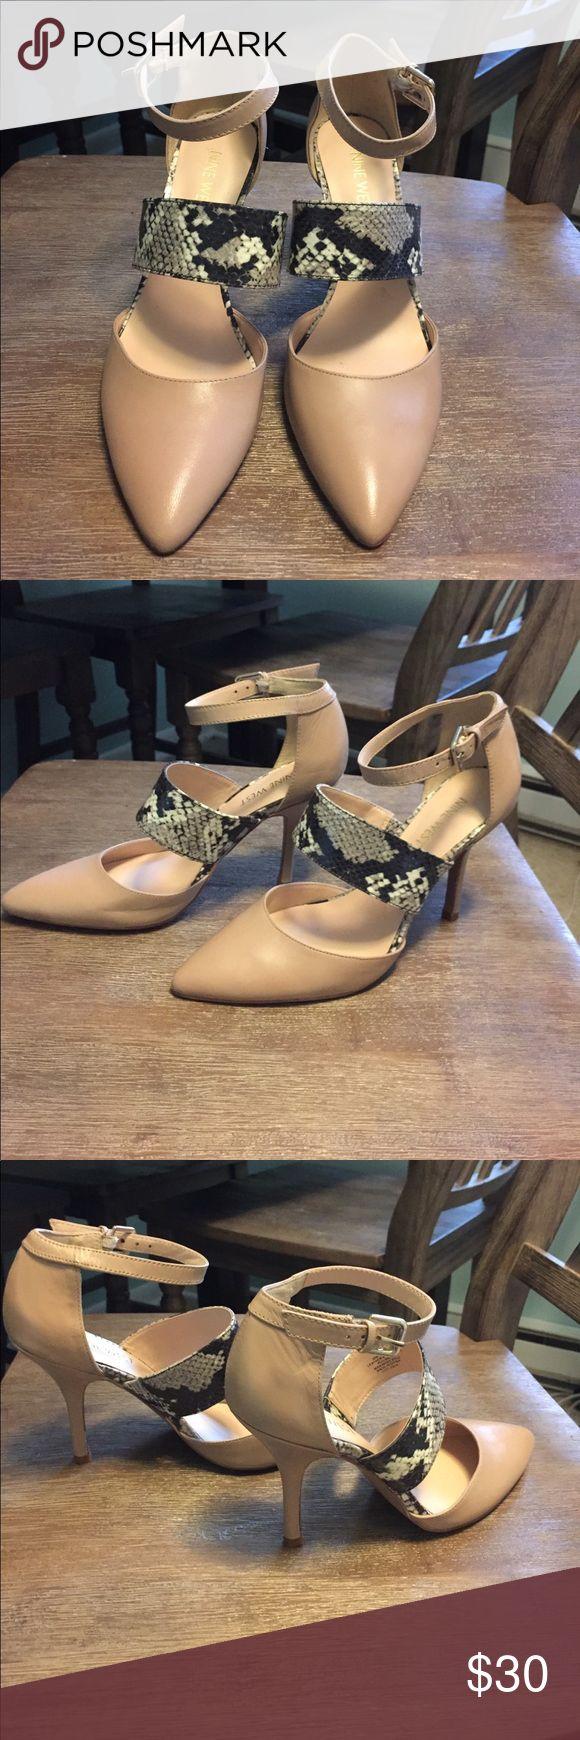 Nine West heels Nine West heels never worn Nine West Shoes Heels